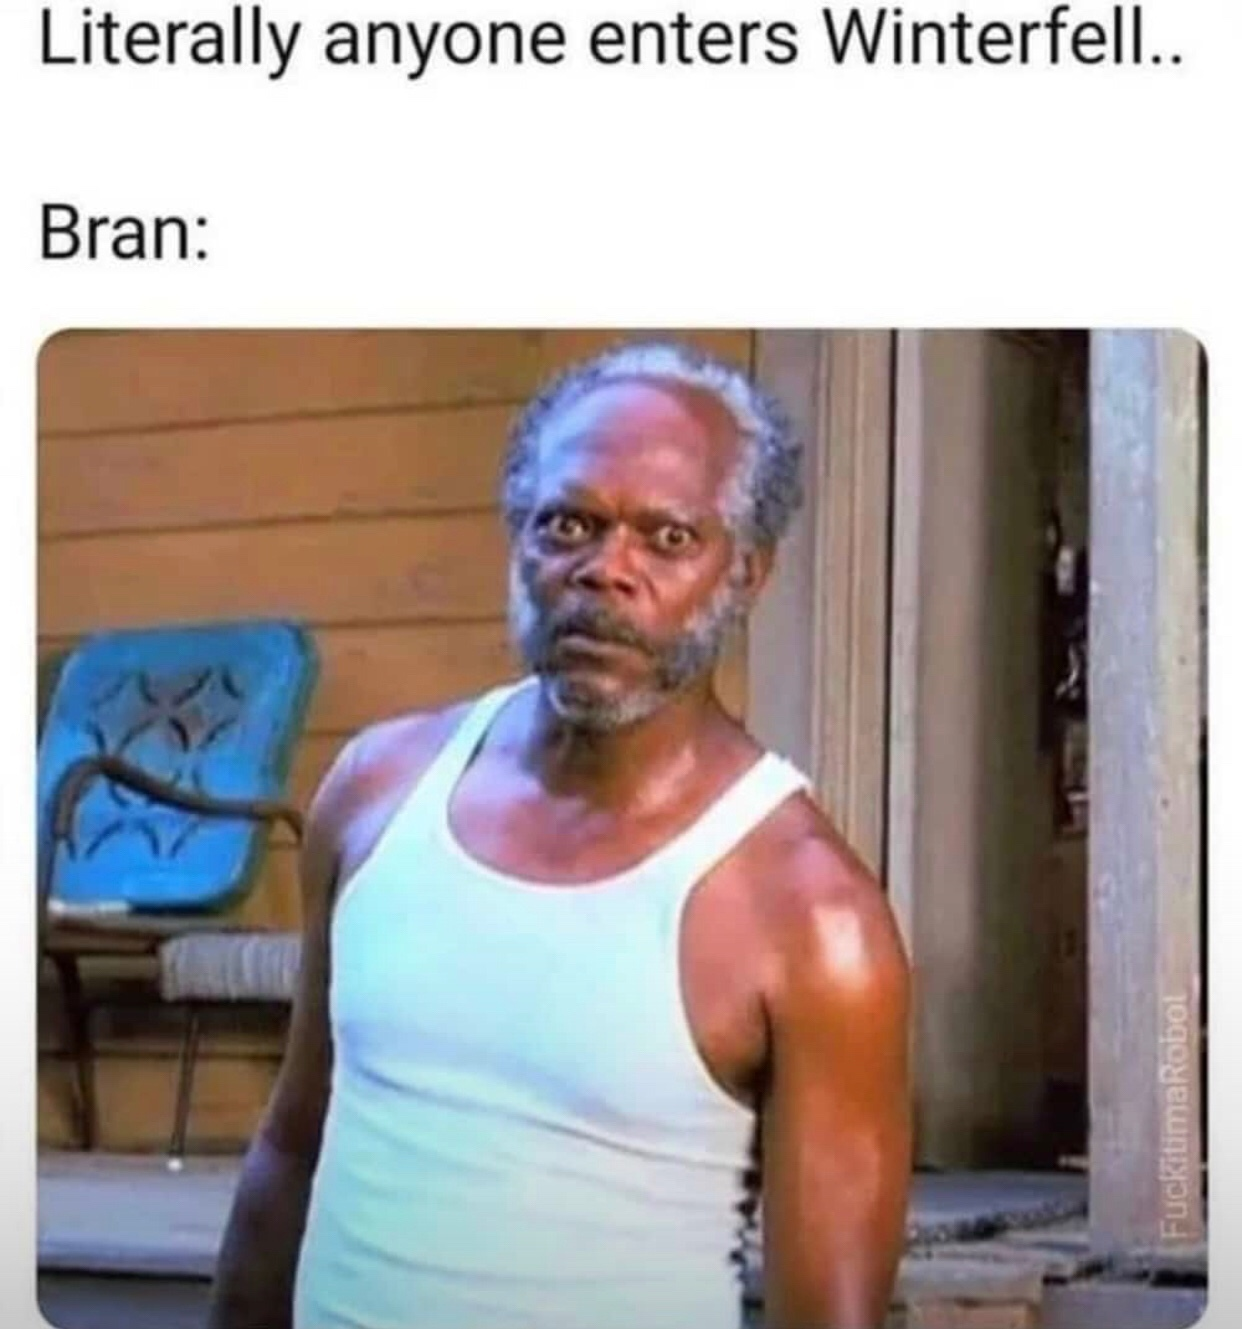 surprise motherfuc*er - meme